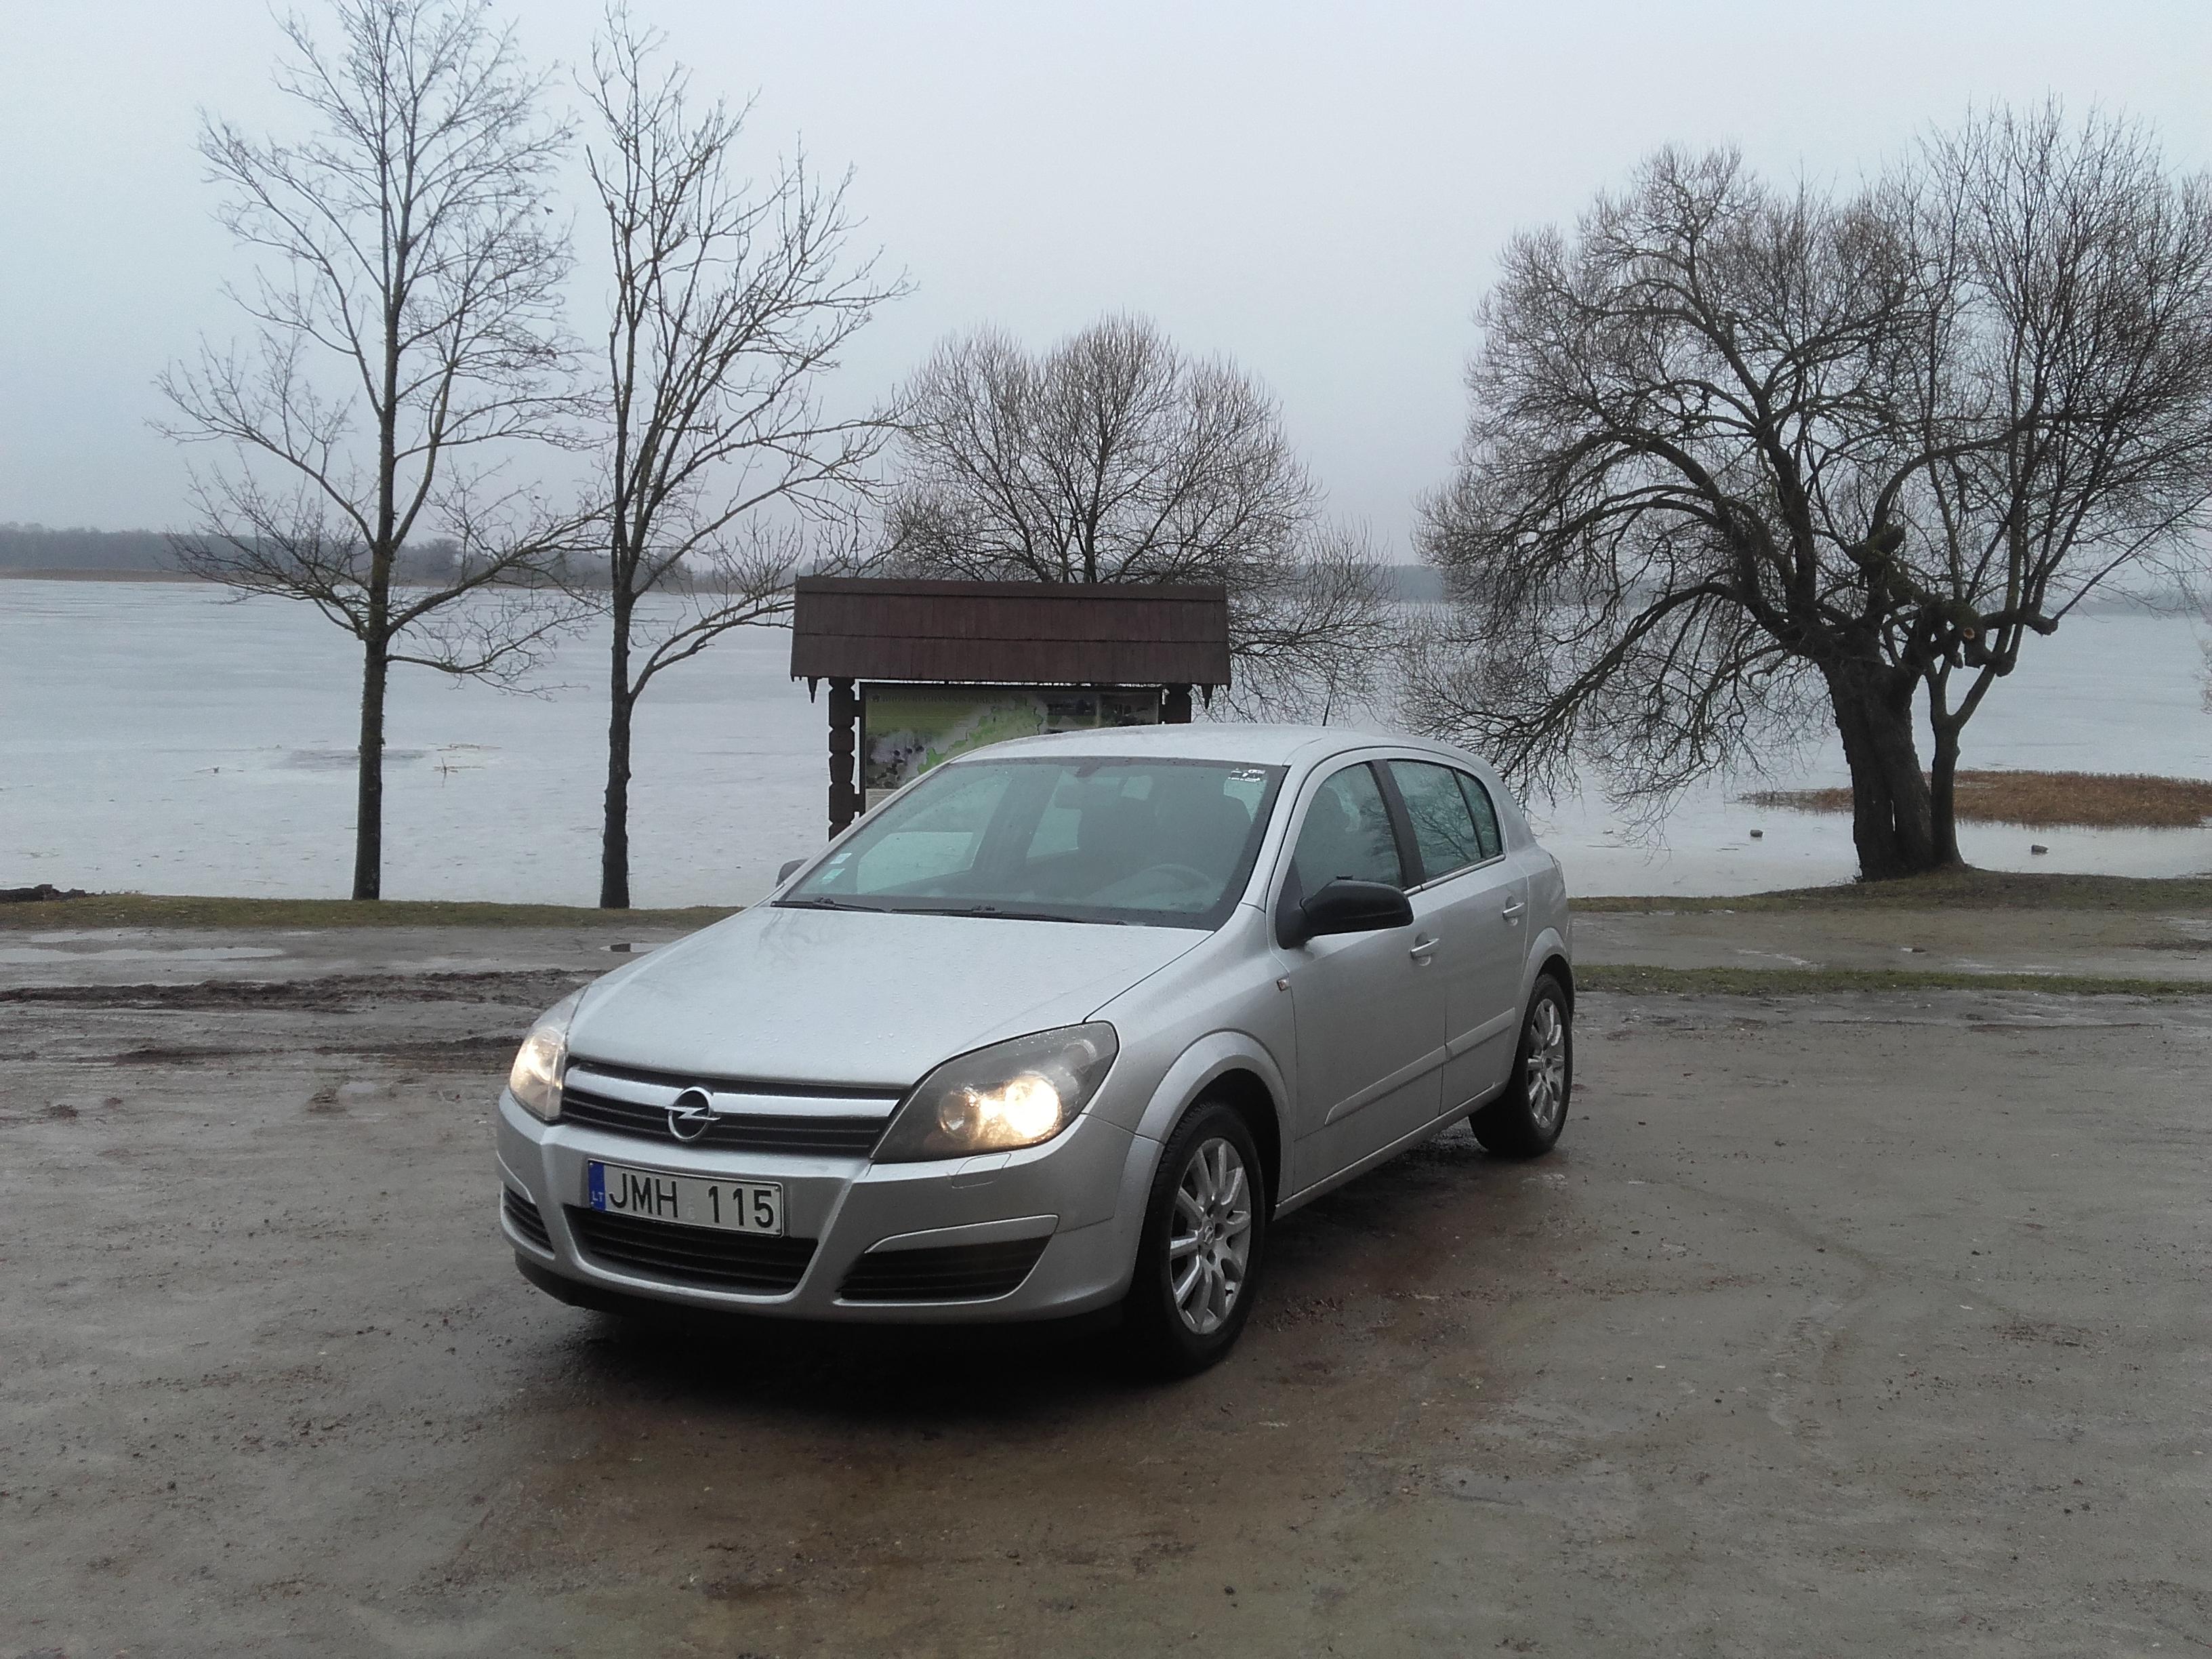 Opel Astra 2005 metų 1,7TDI